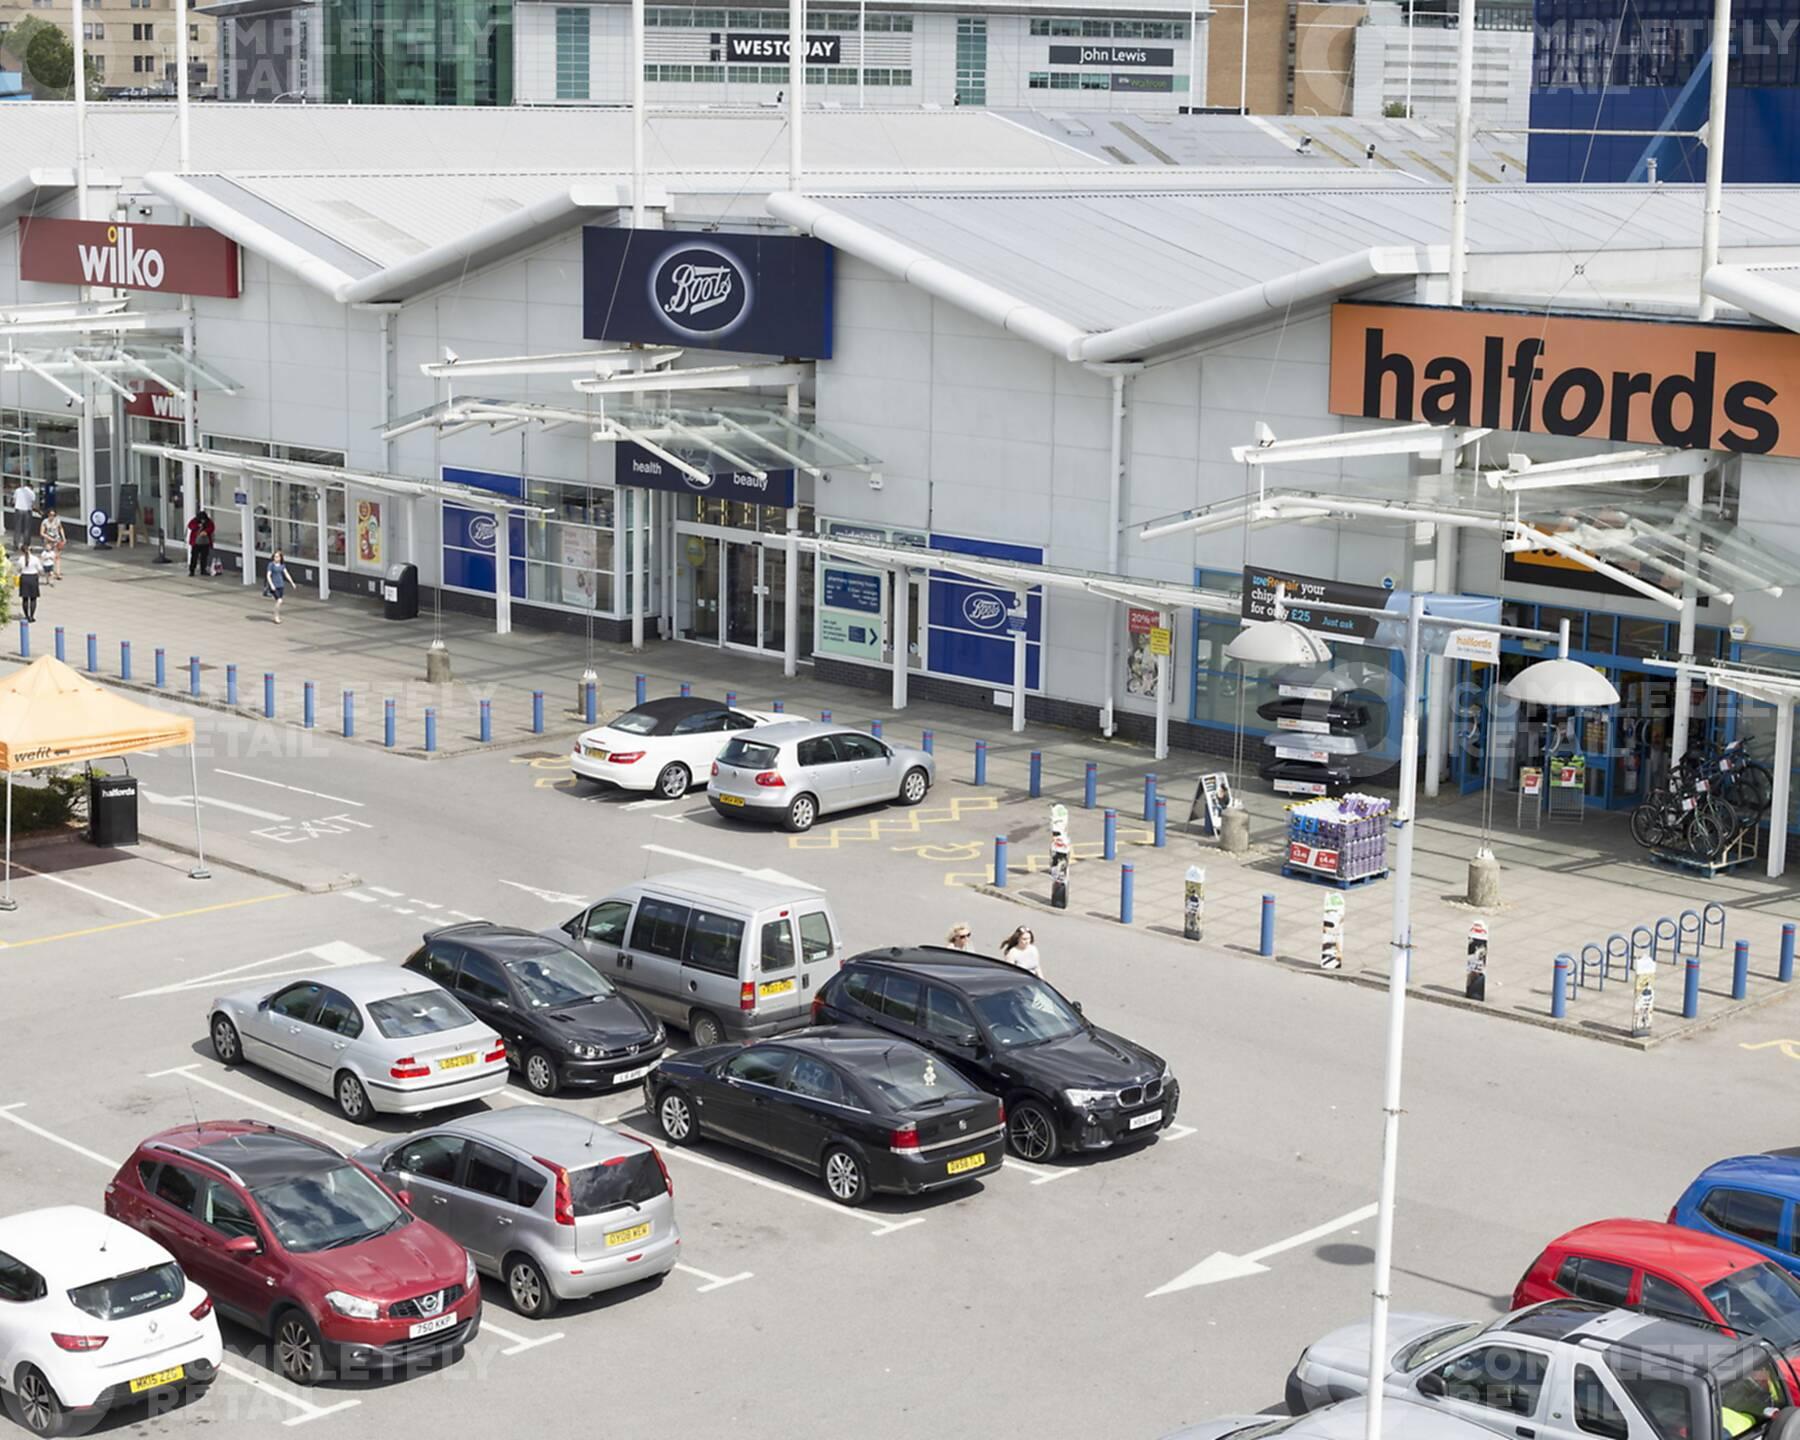 West Quay Retail Park